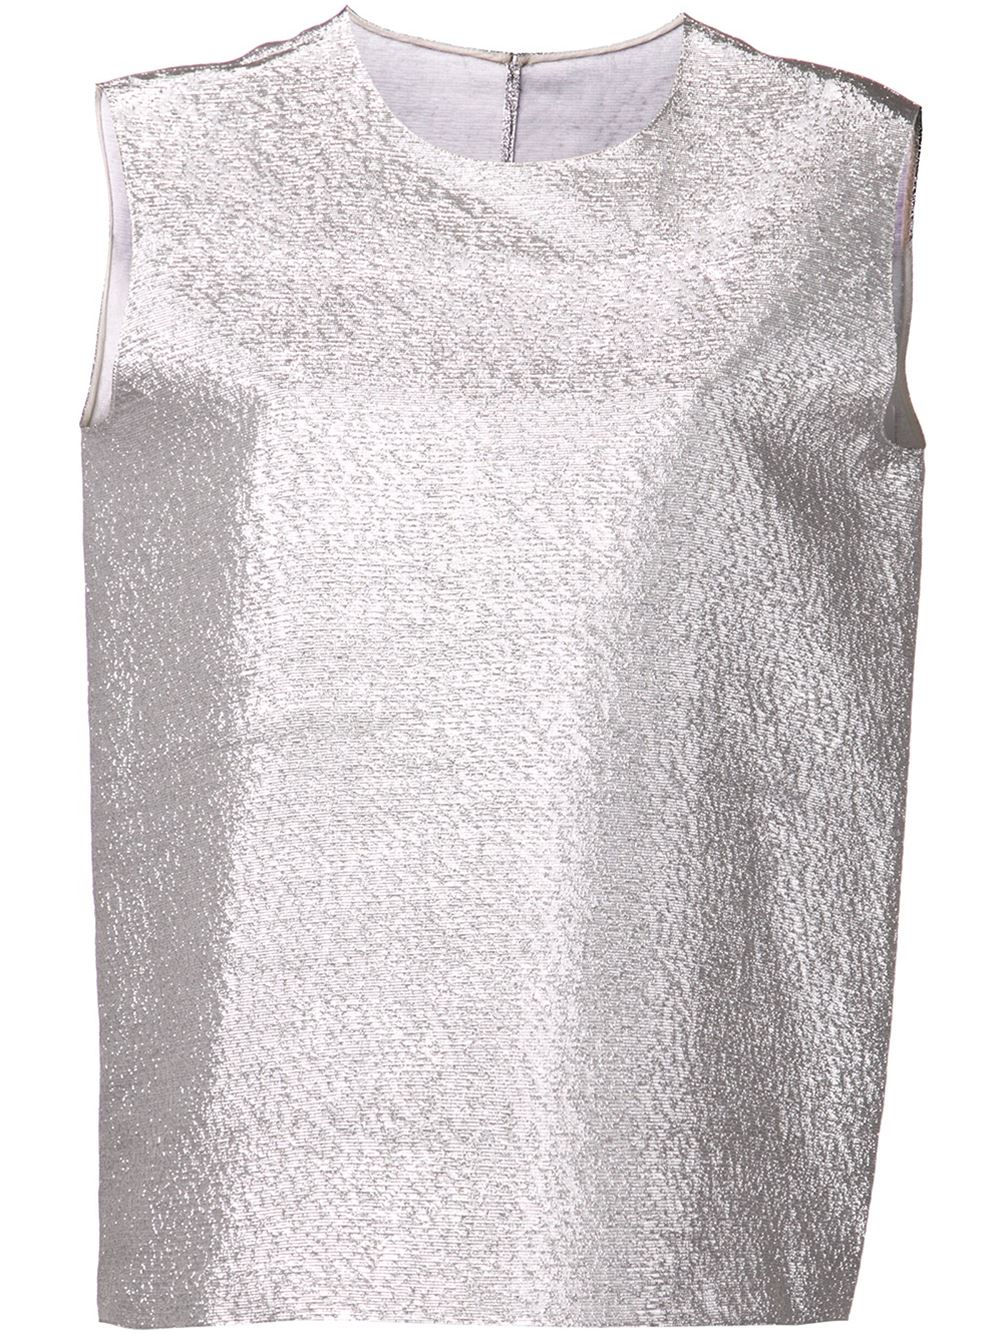 c2ac4af2c7e1a Lyst - Maison Rabih Kayrouz Shimmer Tank Top in Metallic